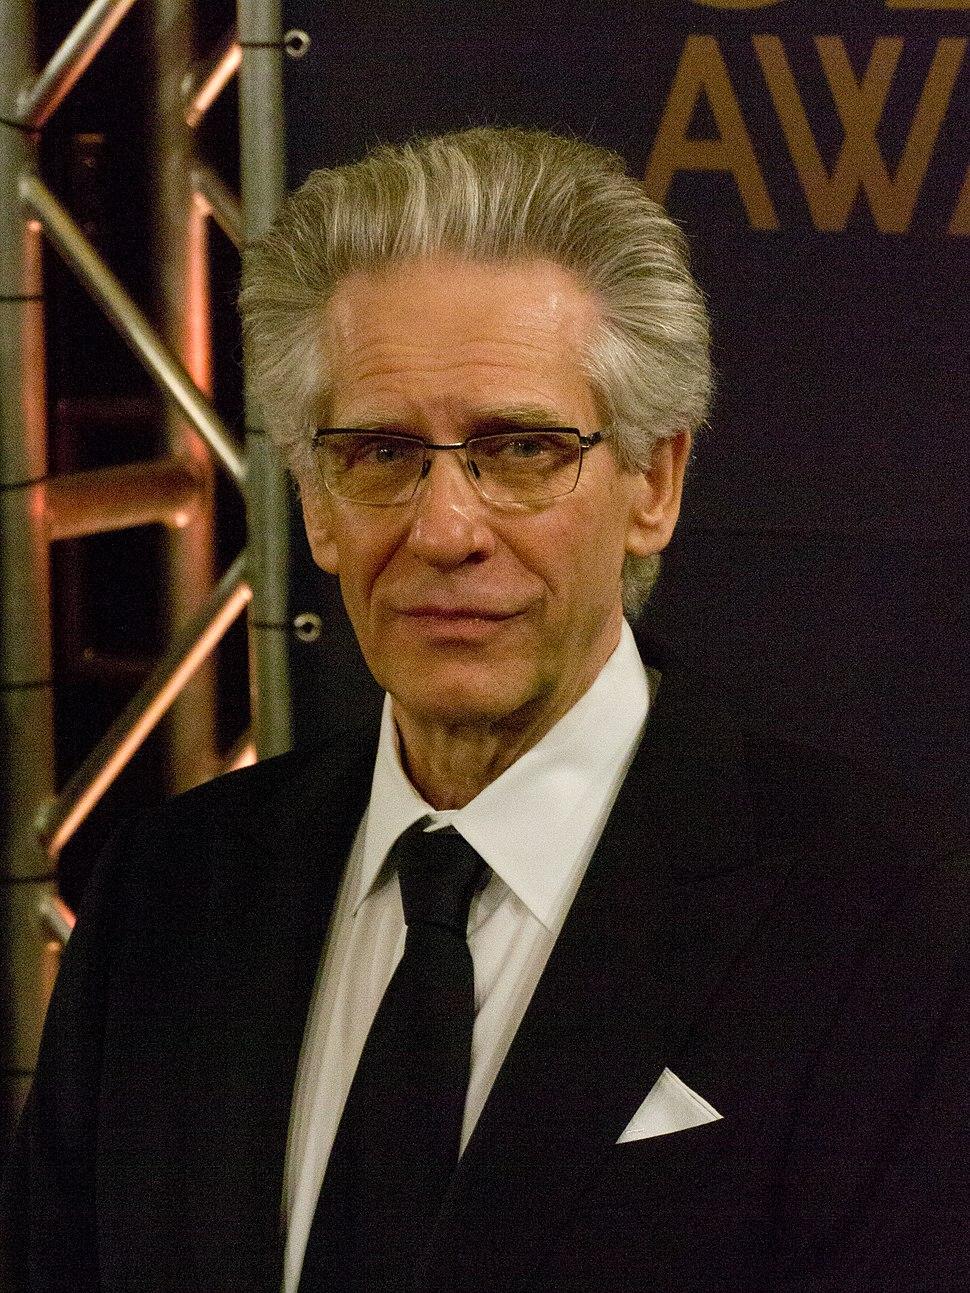 David Cronenberg 2012-03-08